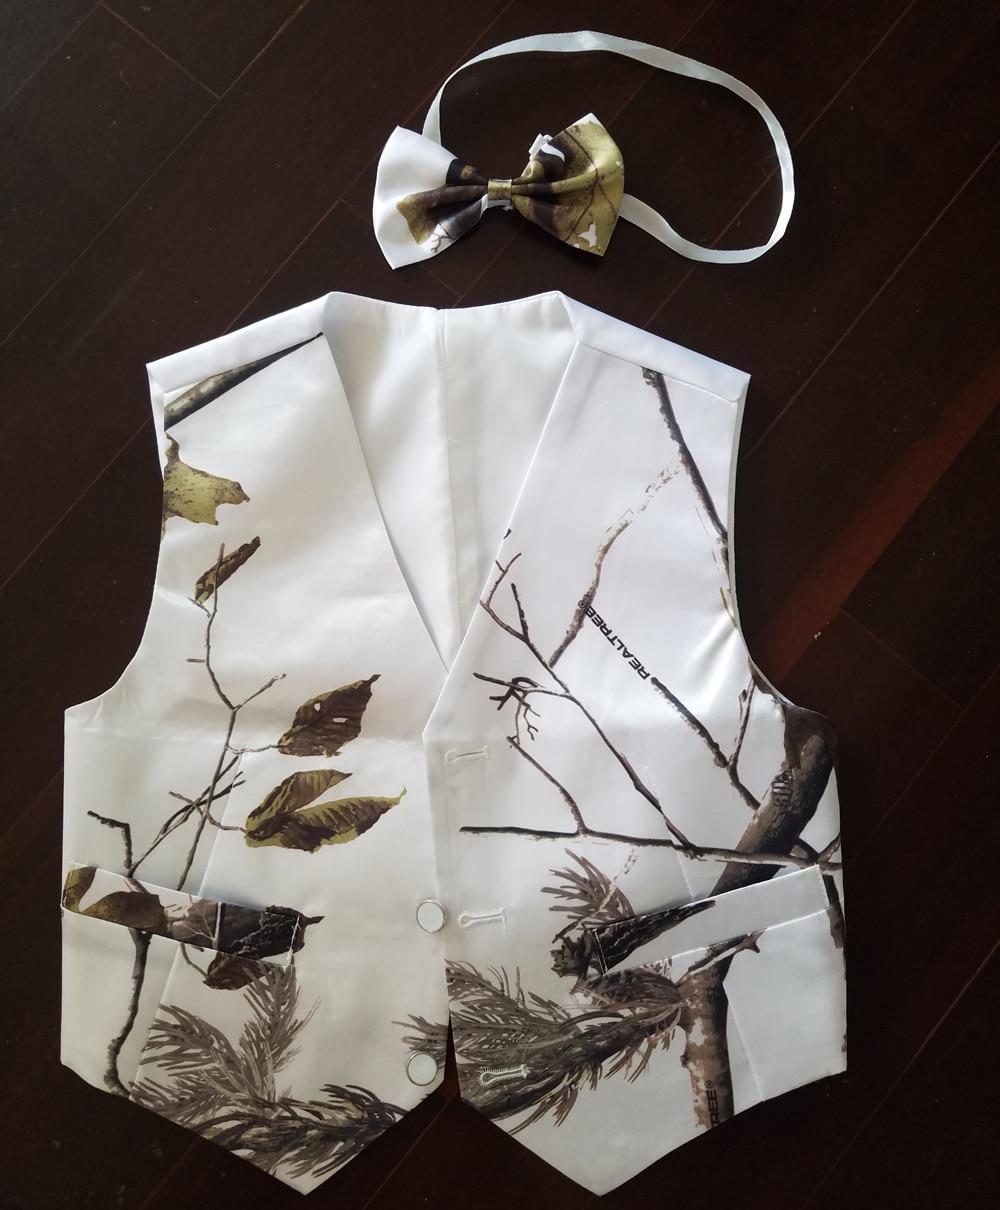 White Realtree Kid Tuxedo Vests Camouflage Formal Wedding Vest For Boy Custom Make Free Shipping